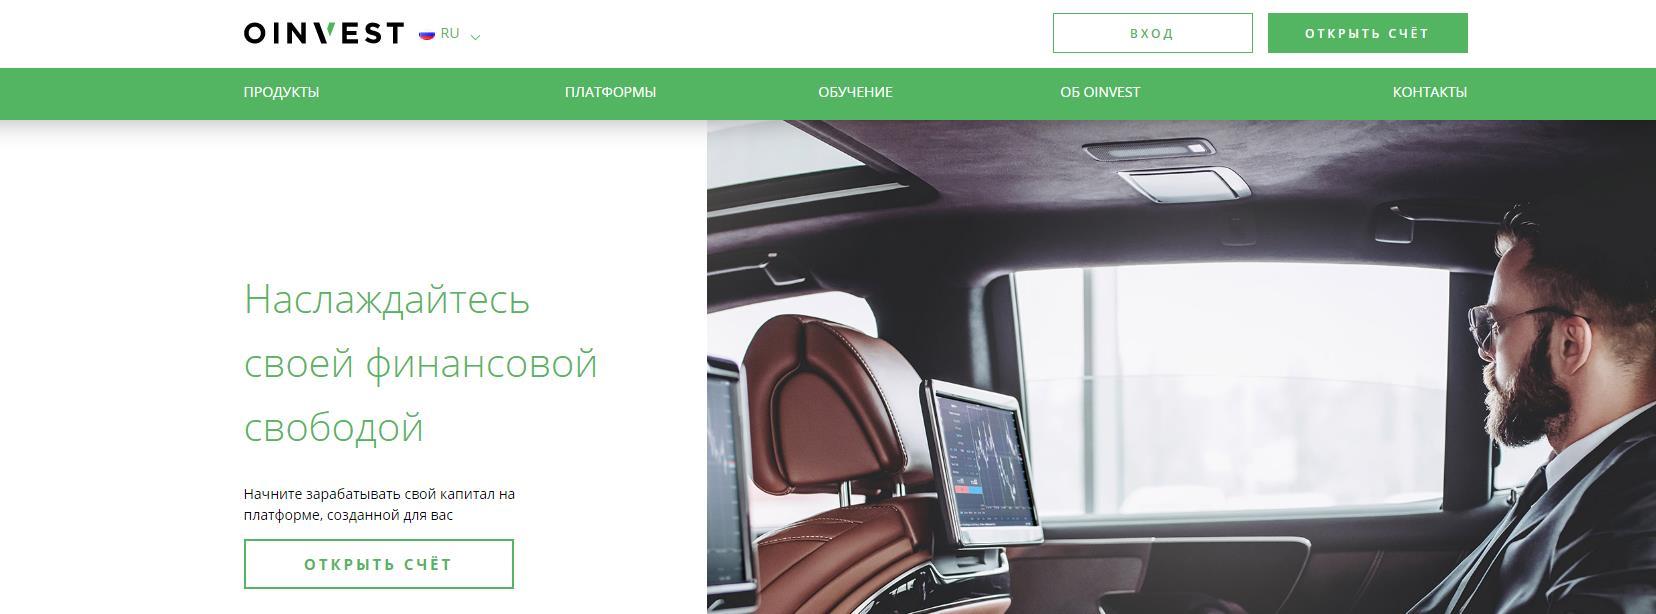 официальный сайт oinvest